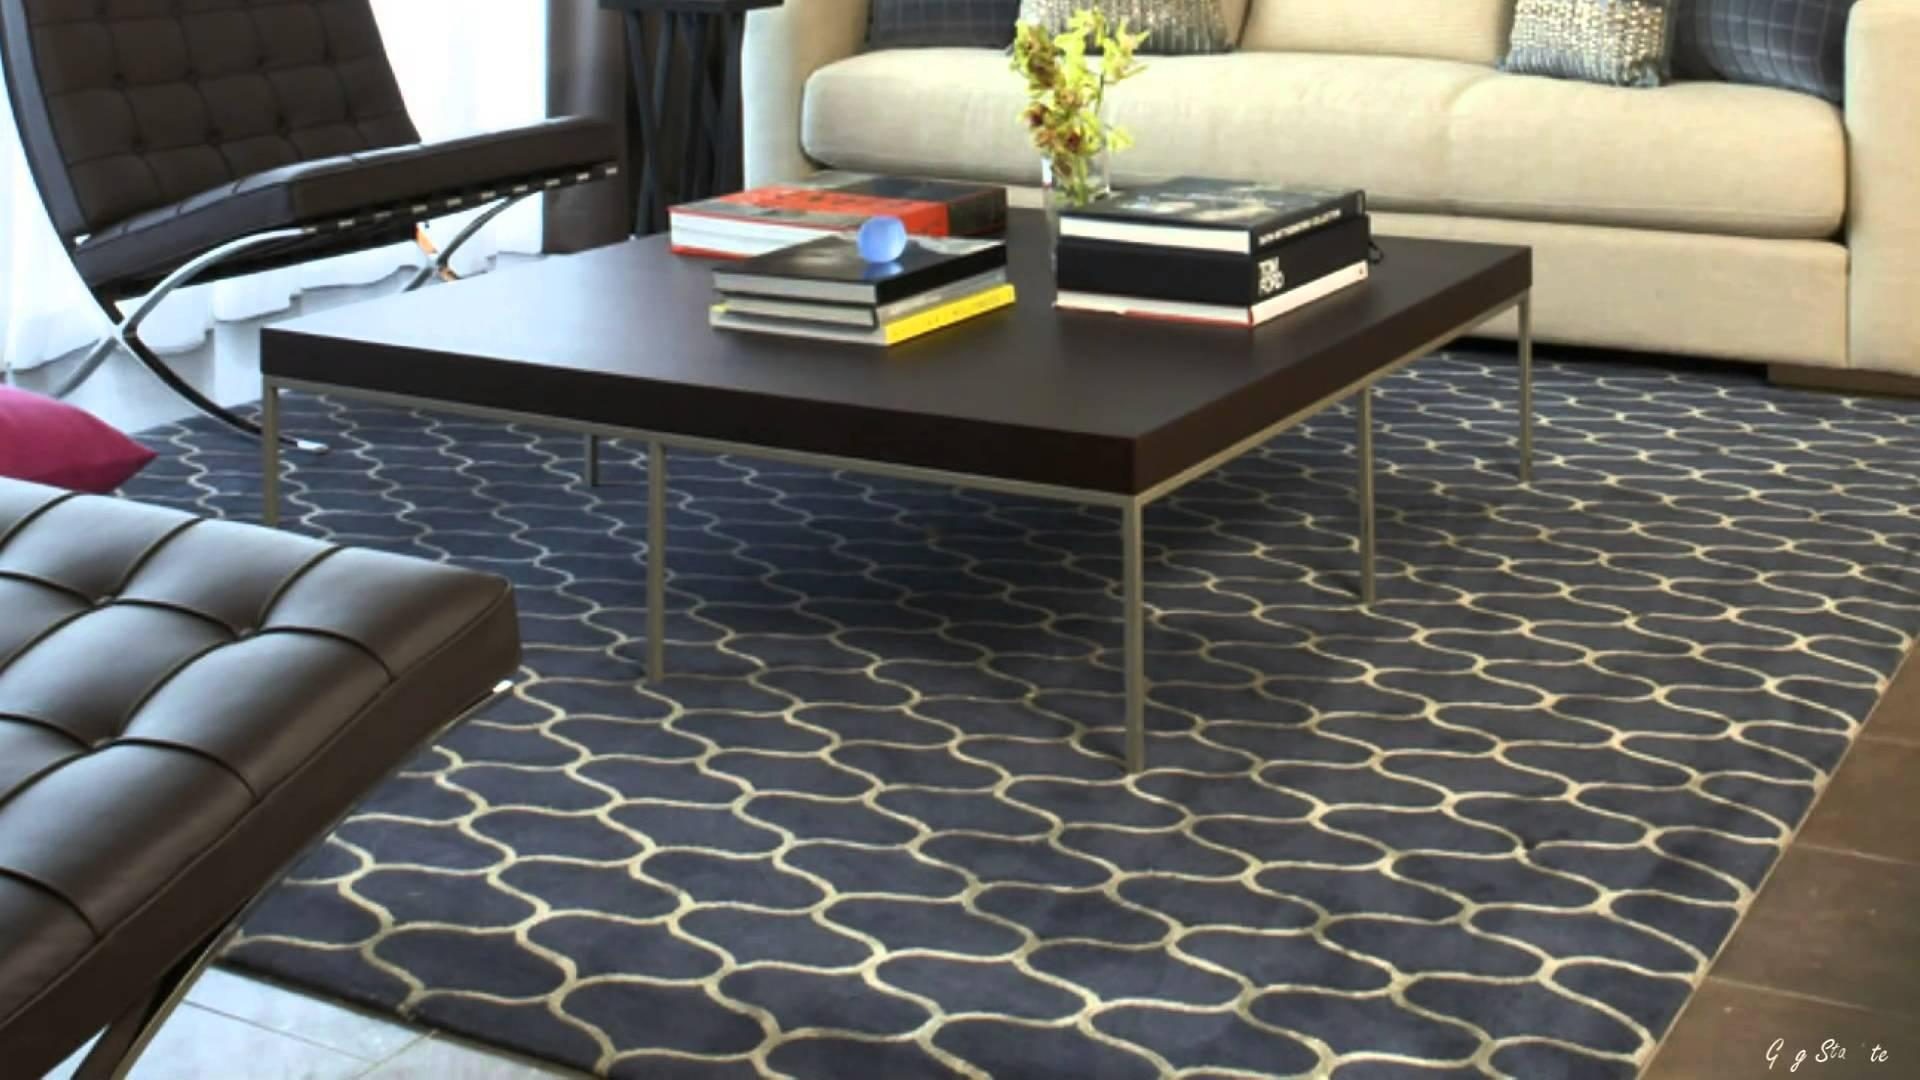 living room carpet patterned carpet - living room design ideas - youtube EDWYLXV